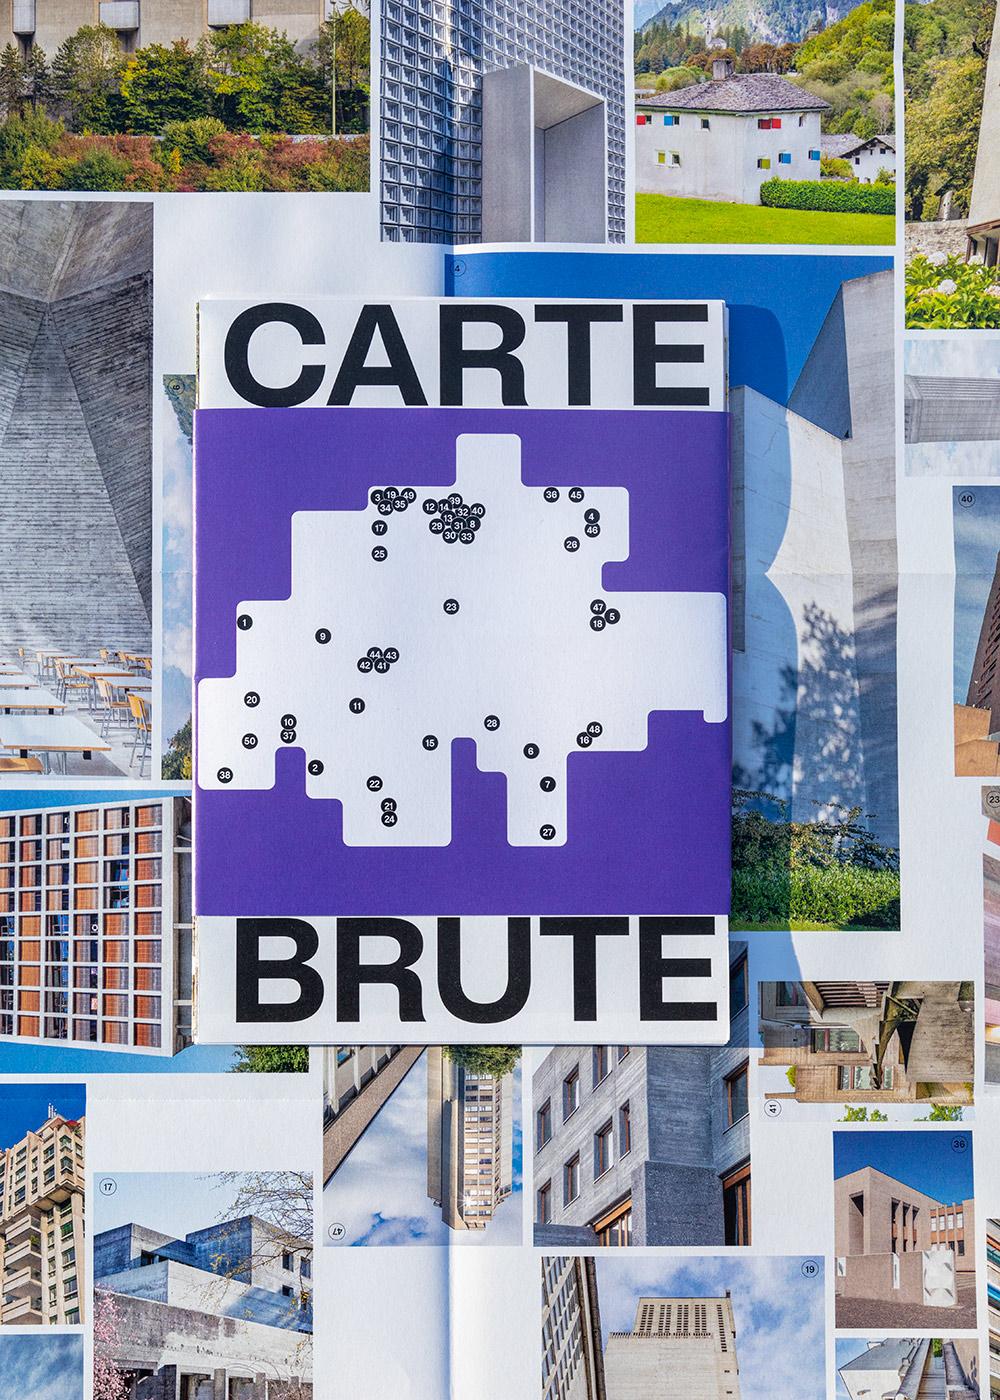 Carte Brute, 50 most striking Swiss béton brut icons from 1927 to today, mood, close-up map, © IMG: Karin Bürki / HEARTBRUT, © DESIGN: lugma I Shop on Heartbrut.com